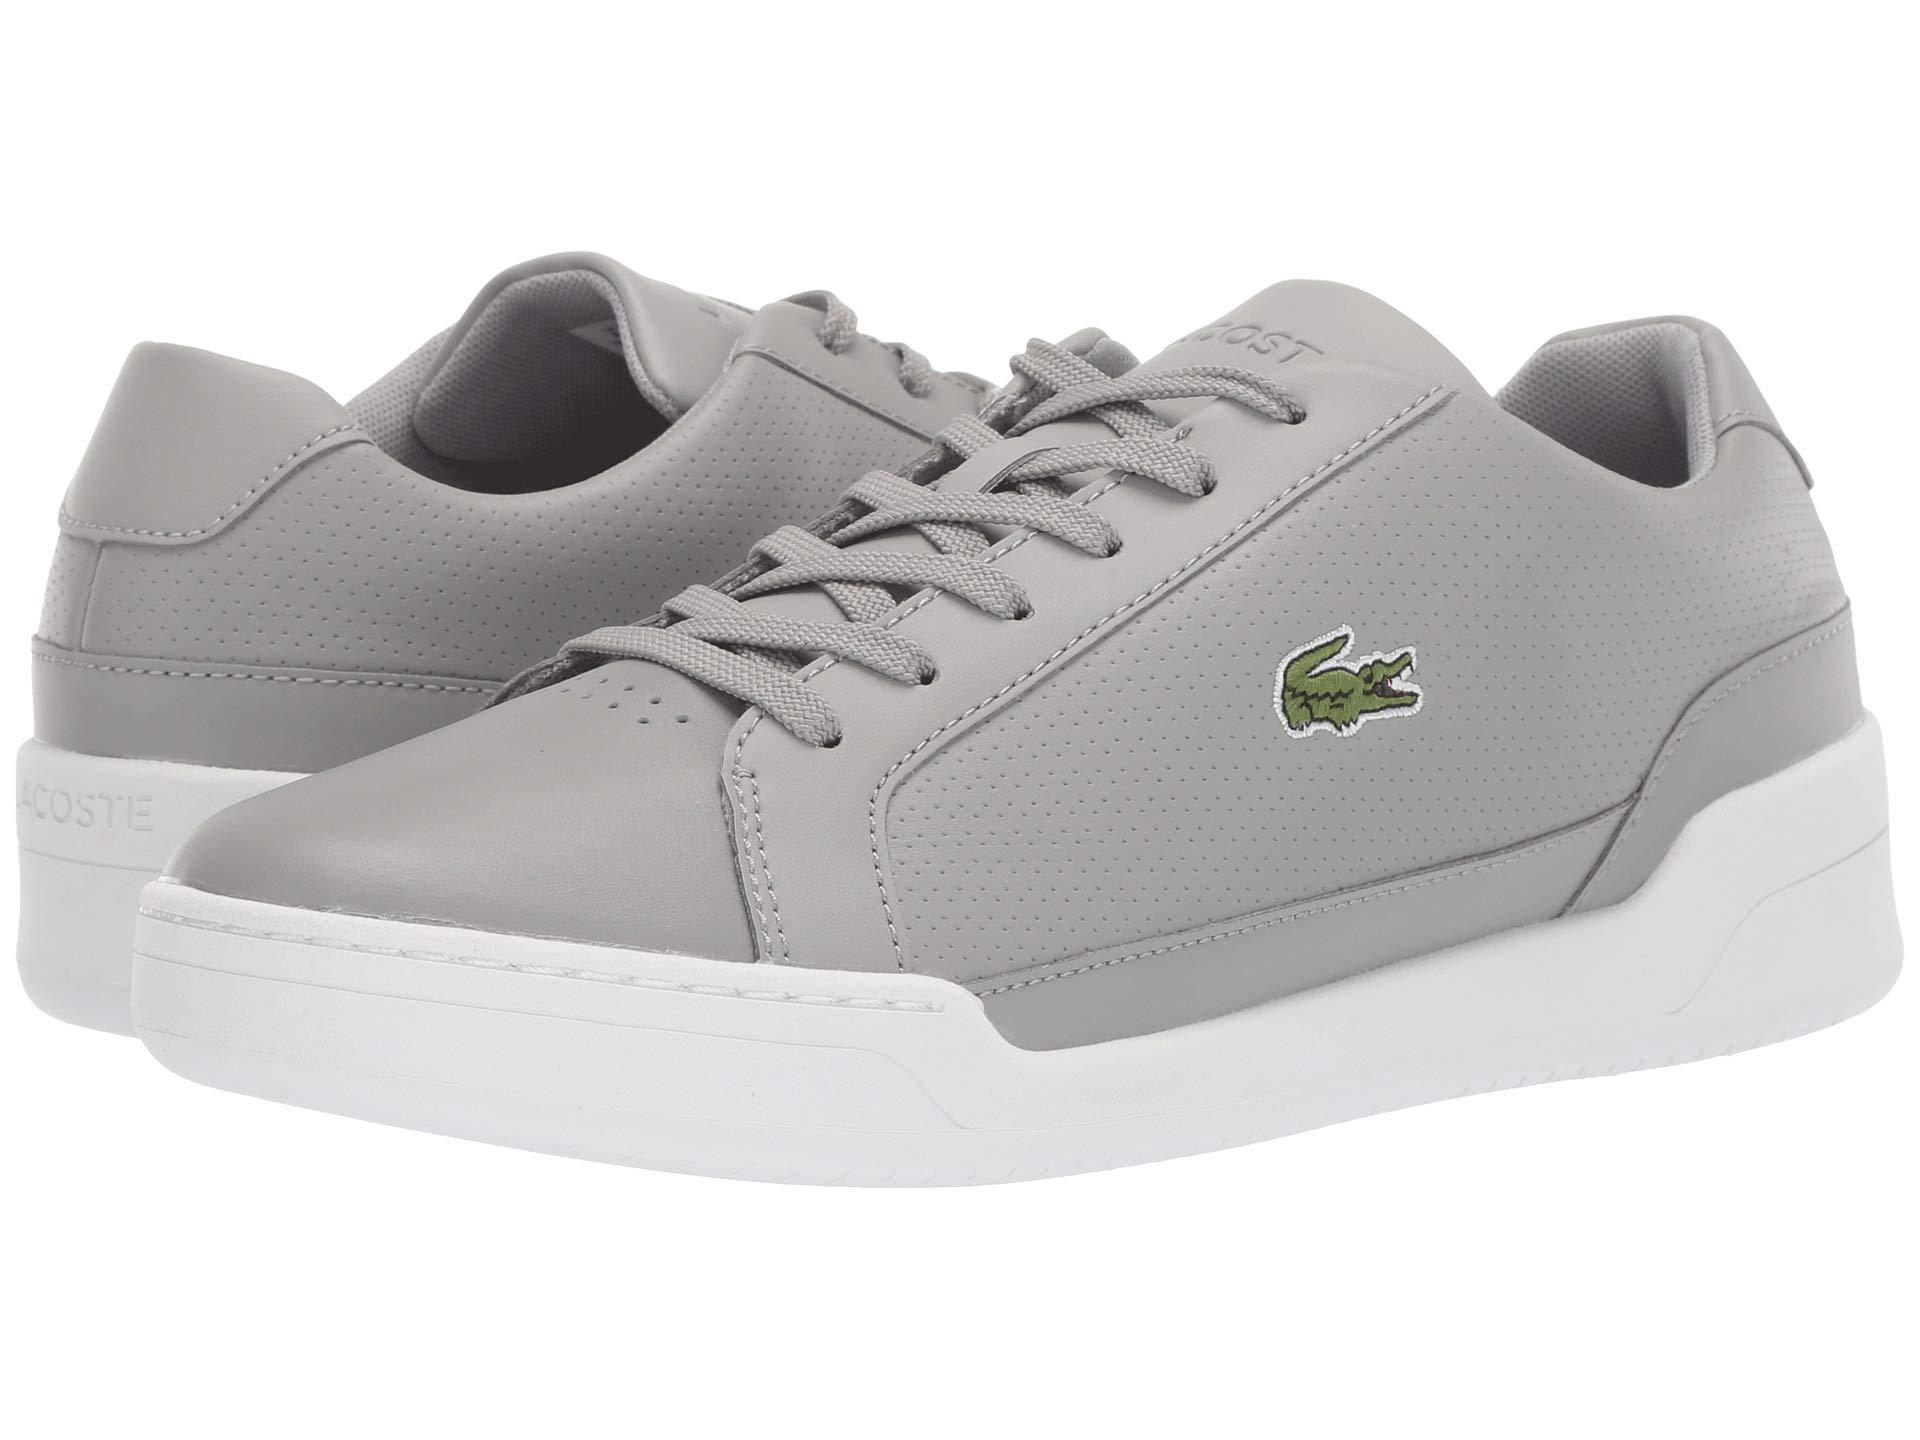 64e21a8eb Lyst - Lacoste Challenge 119 2 Sma (grey white) Men s Shoes in Gray ...